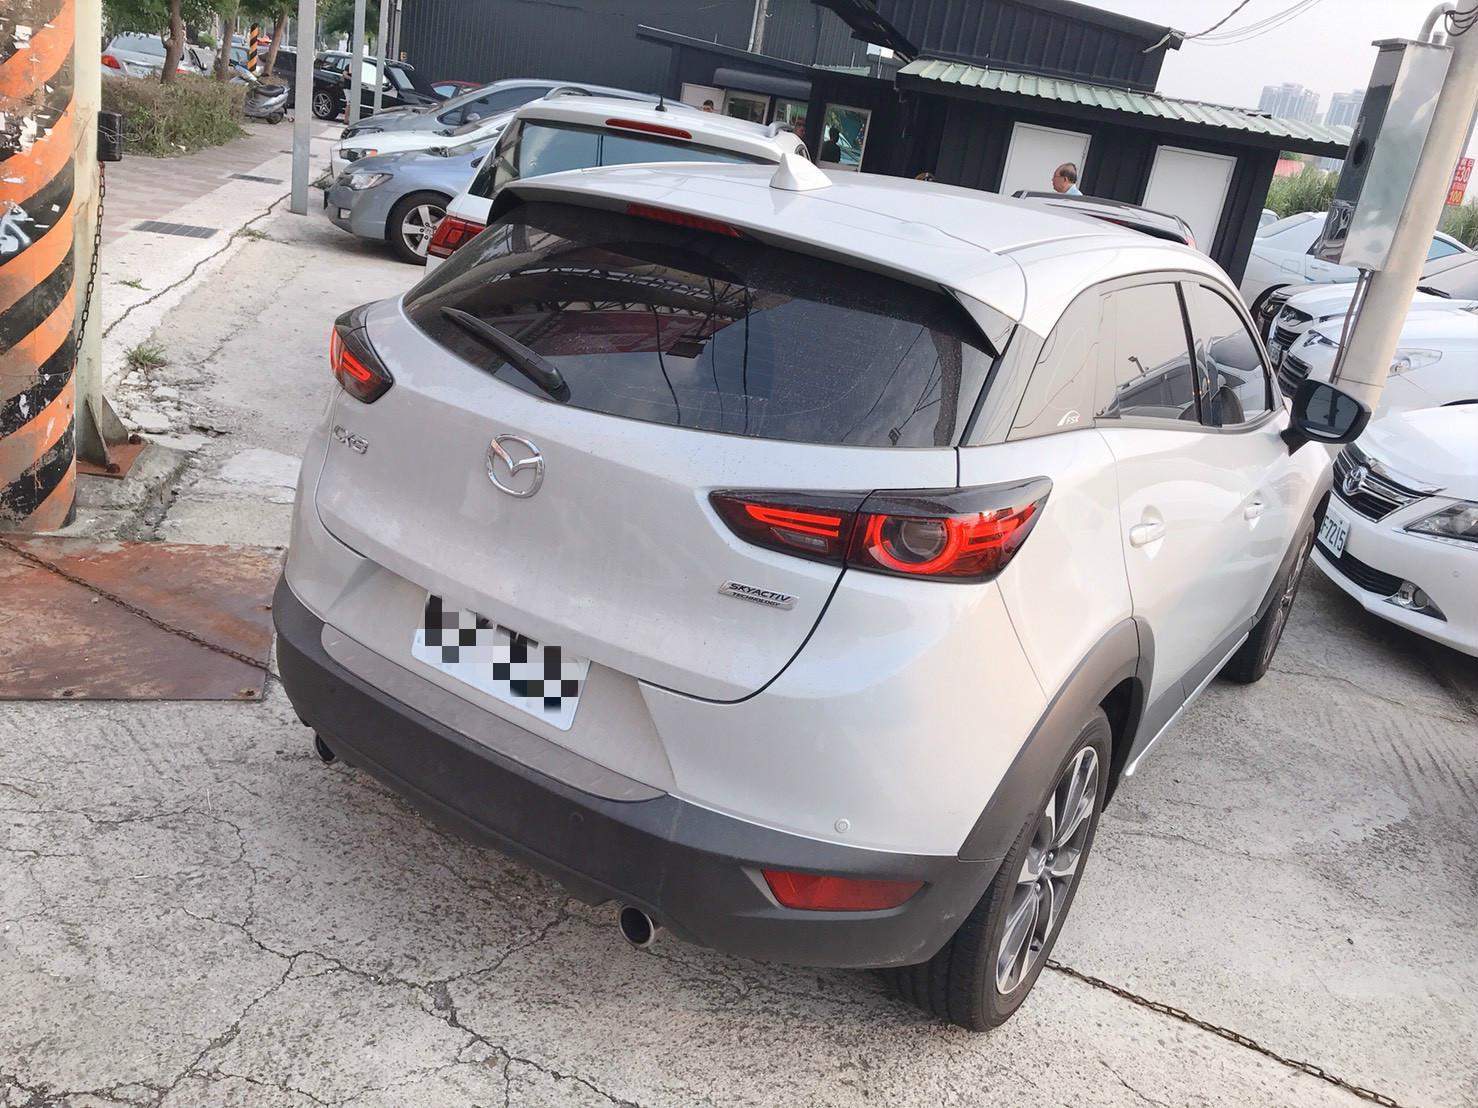 CX-3 汽油版 只跑5000 全額貸 超貸 車換車 皆可辦理